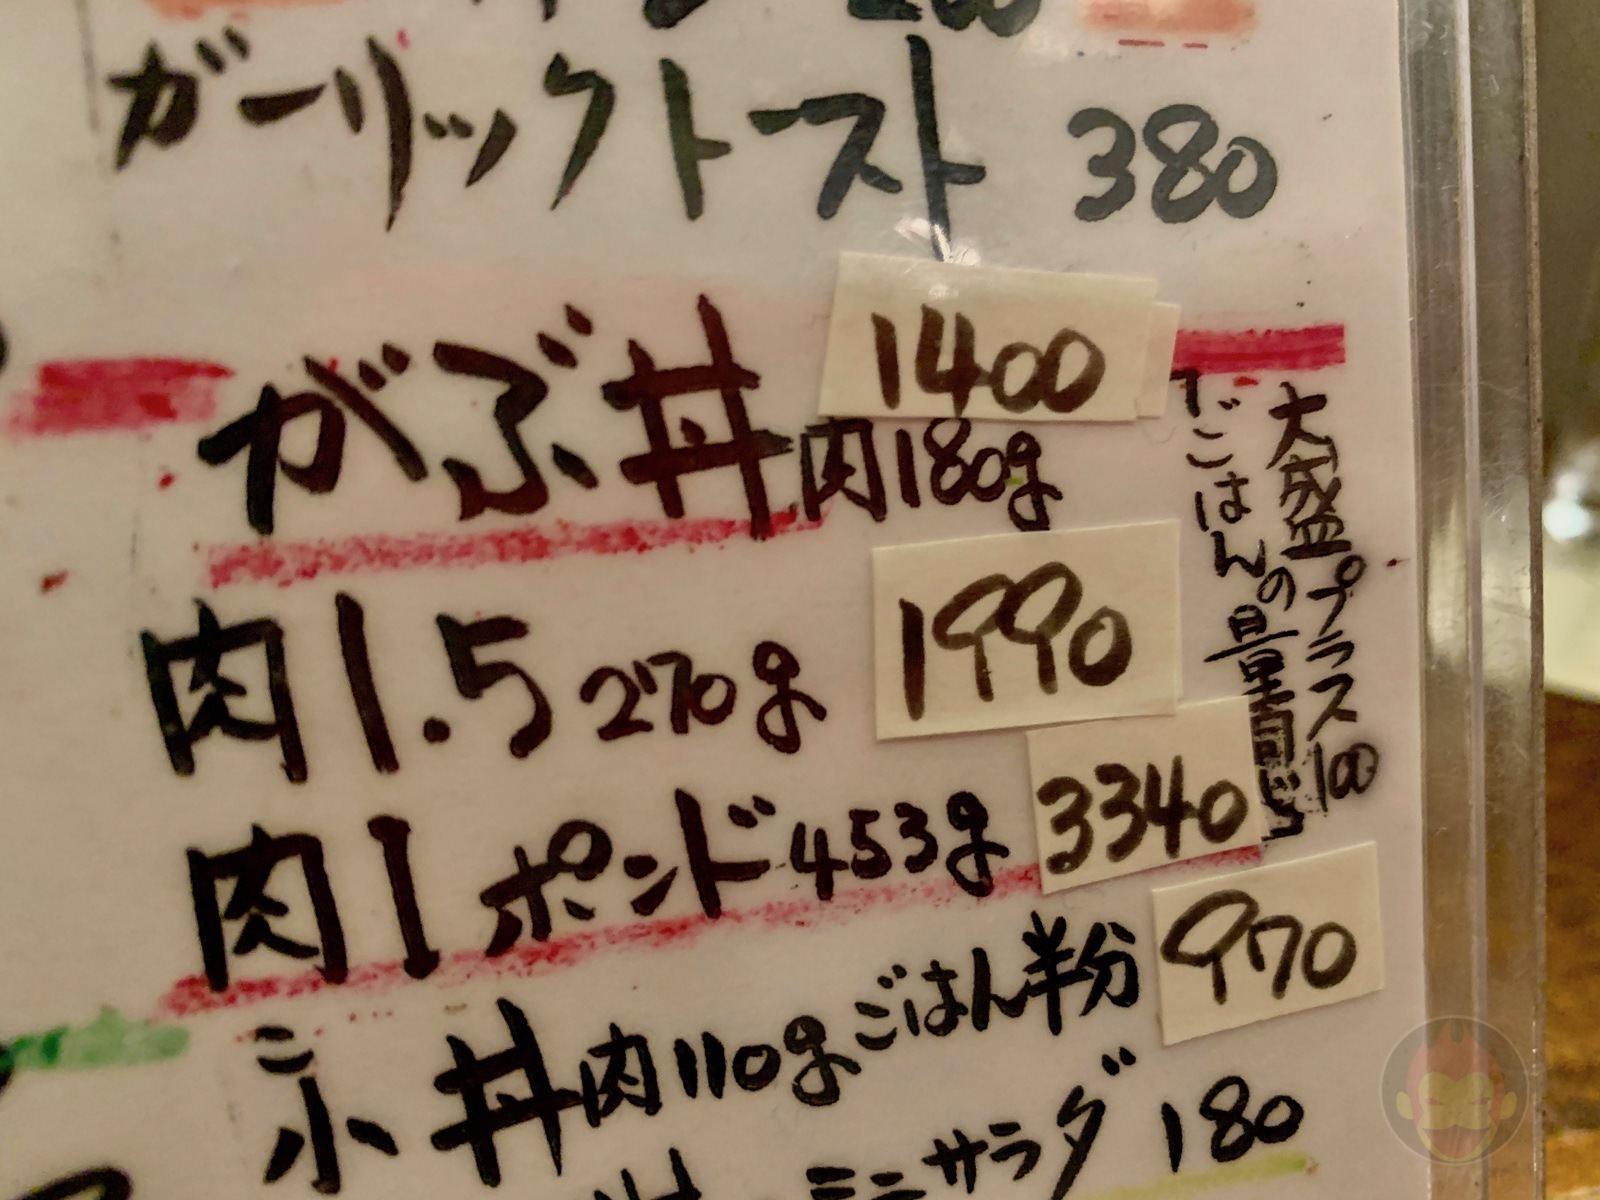 Kuisinbo-Gabu-Musasi-koyama-01.jpg